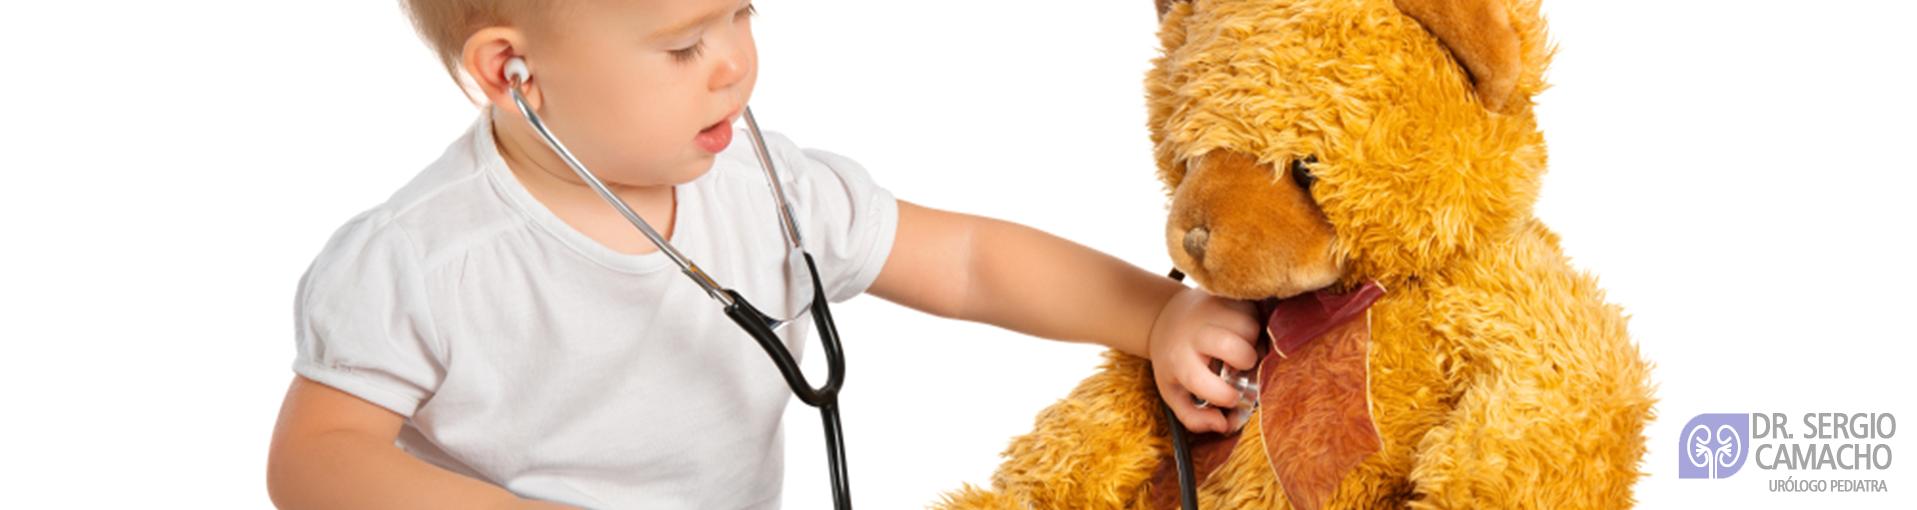 Urólogo pediatra